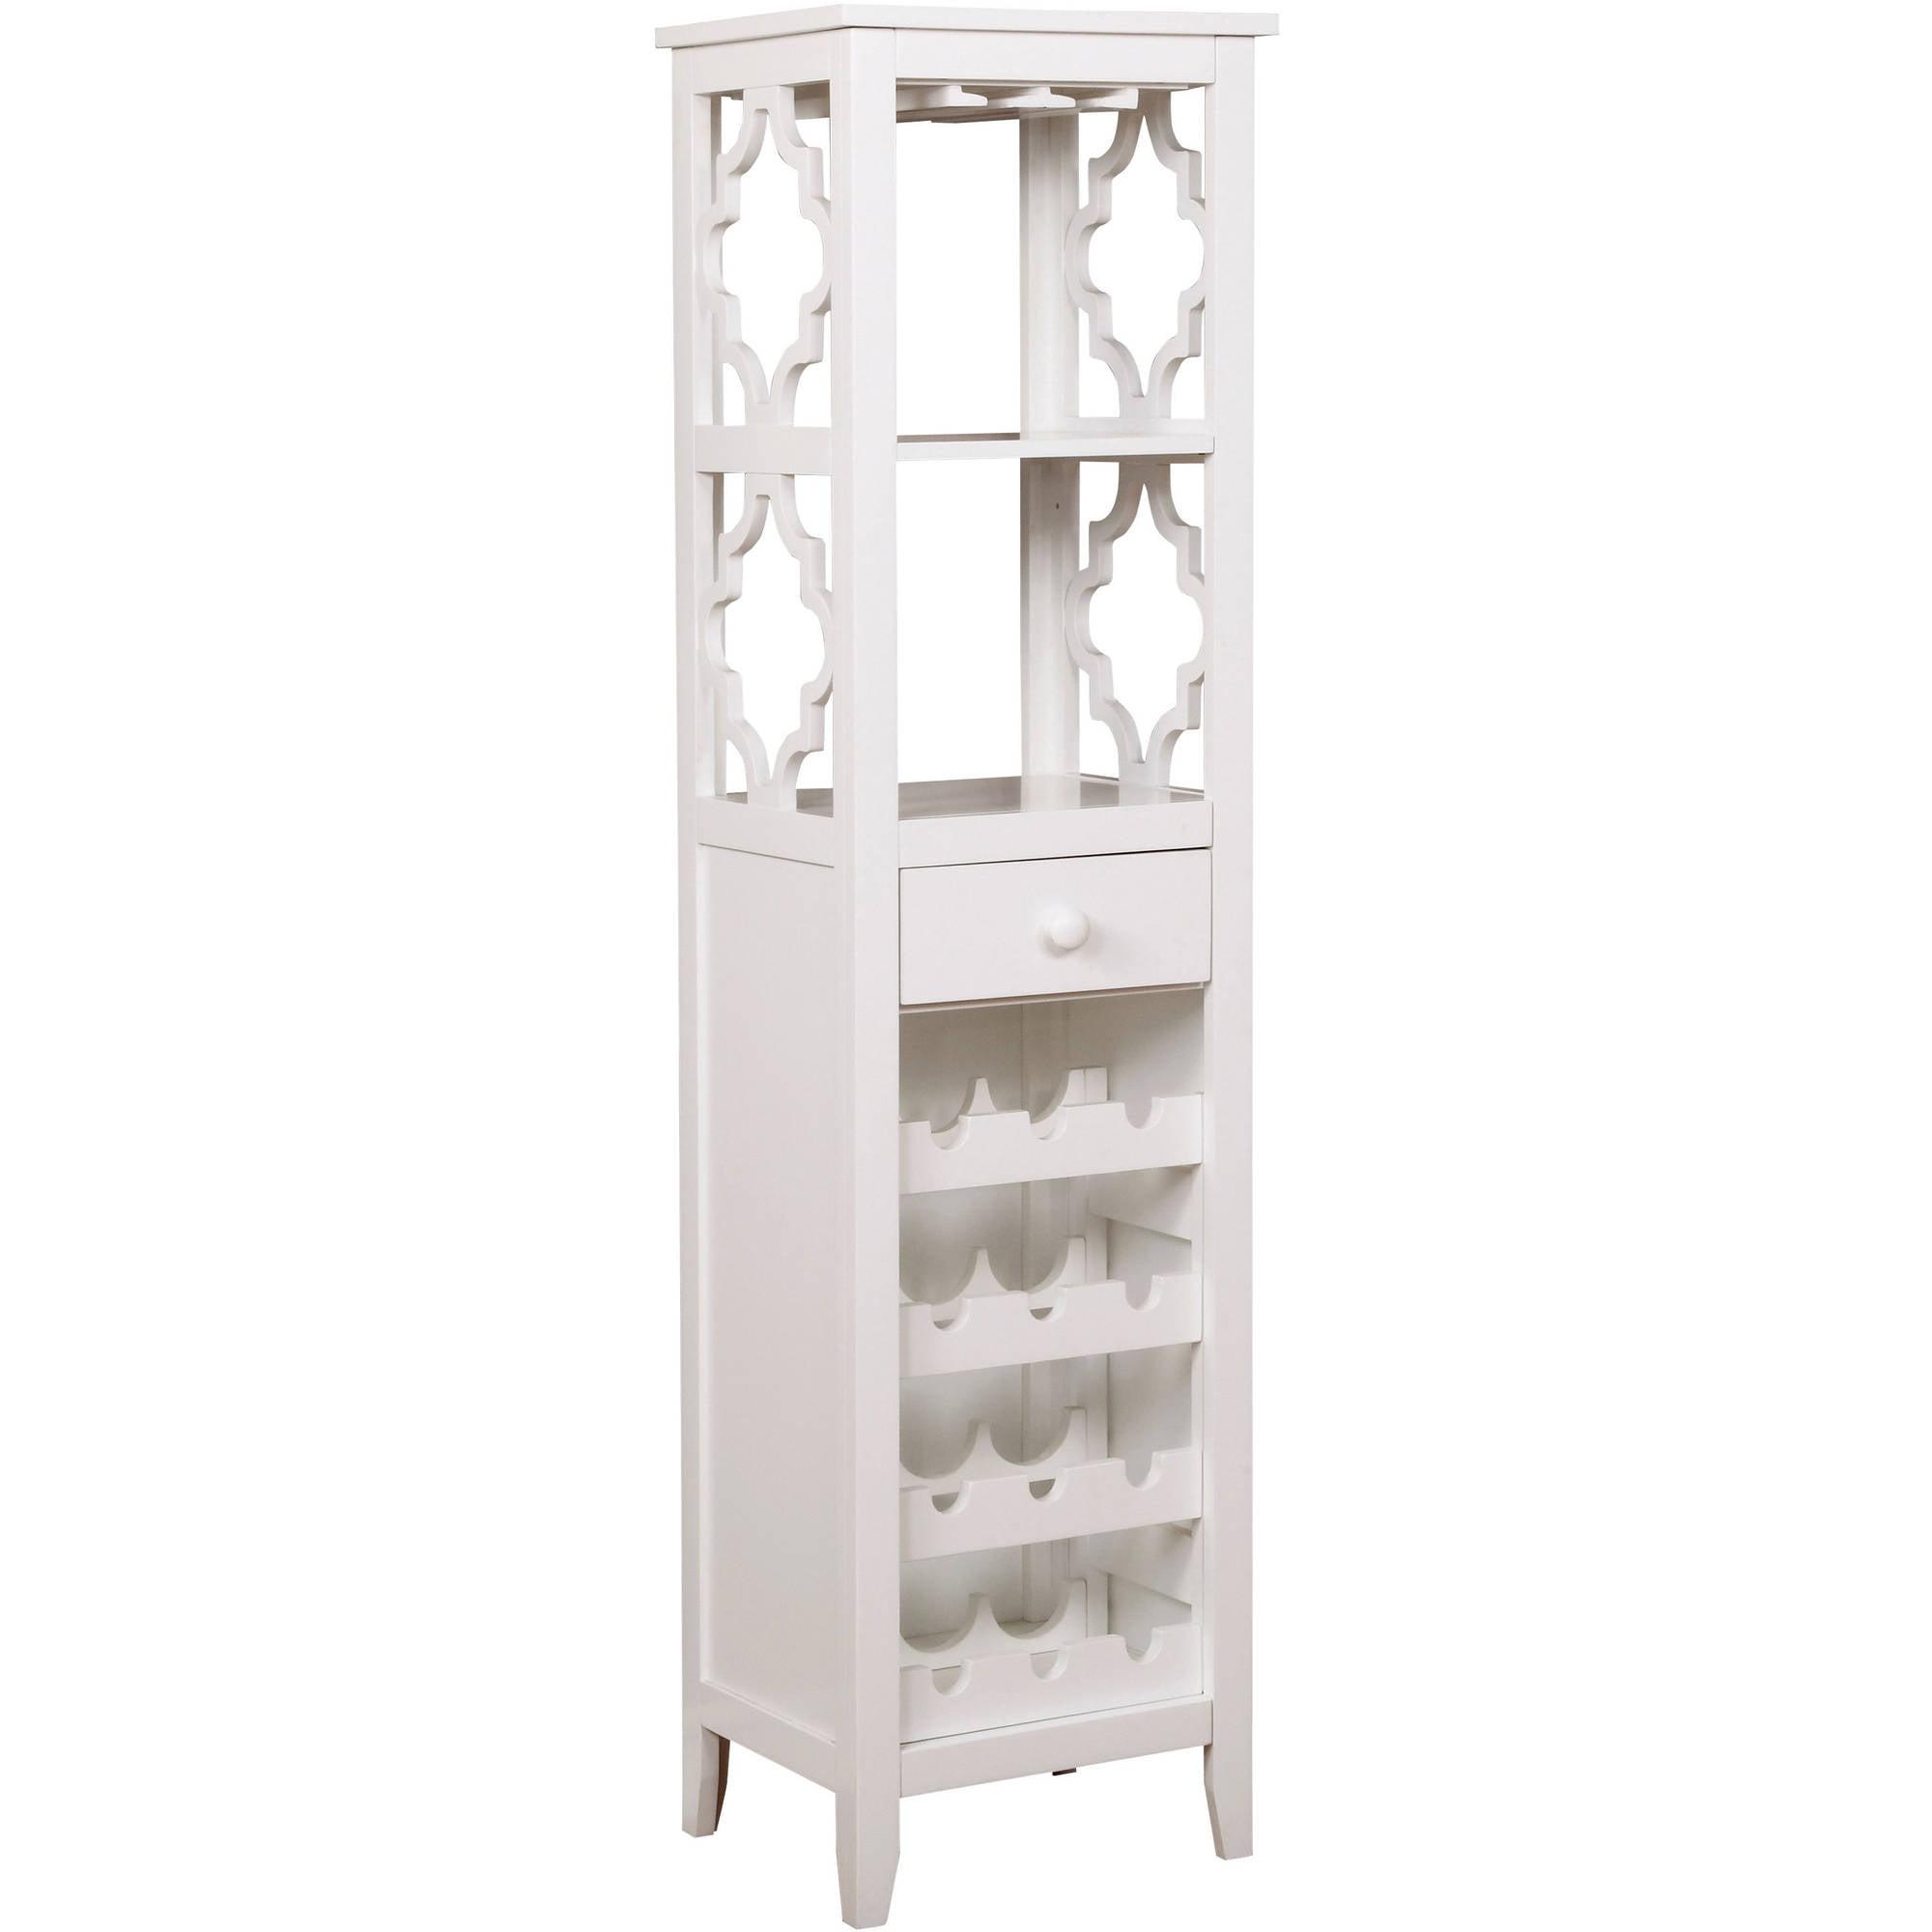 Furniture of America Mejia Wine Cabinet, White by Furniture of America